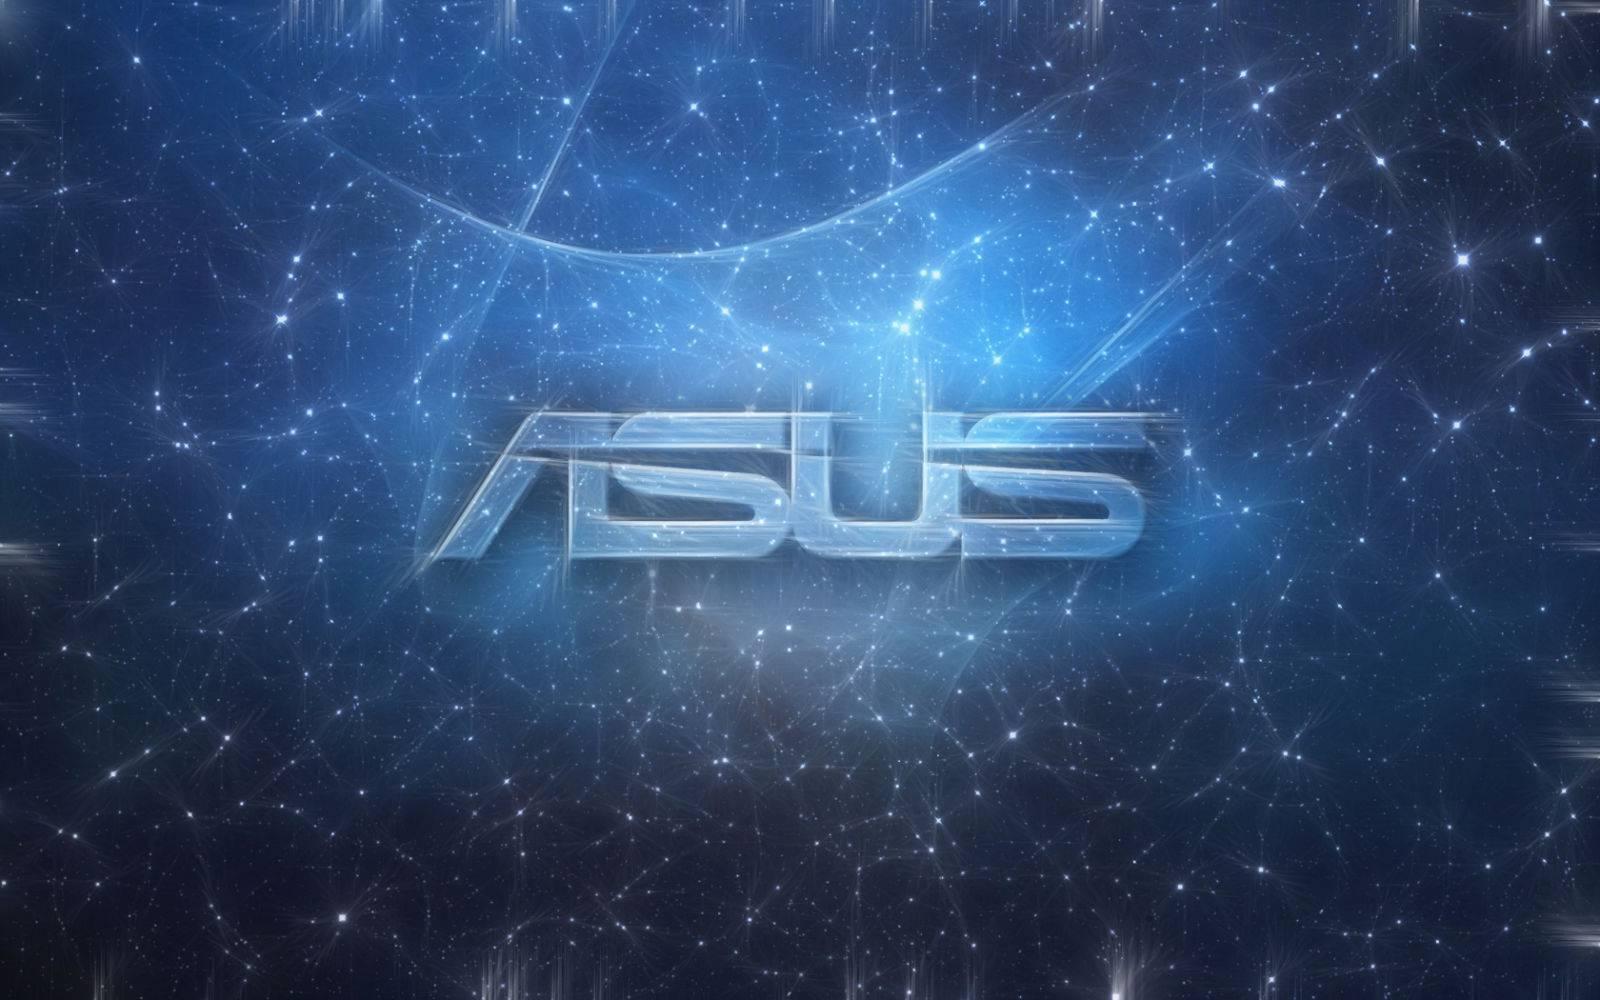 Asus Blue Wallpaper: Asus Desktop Background